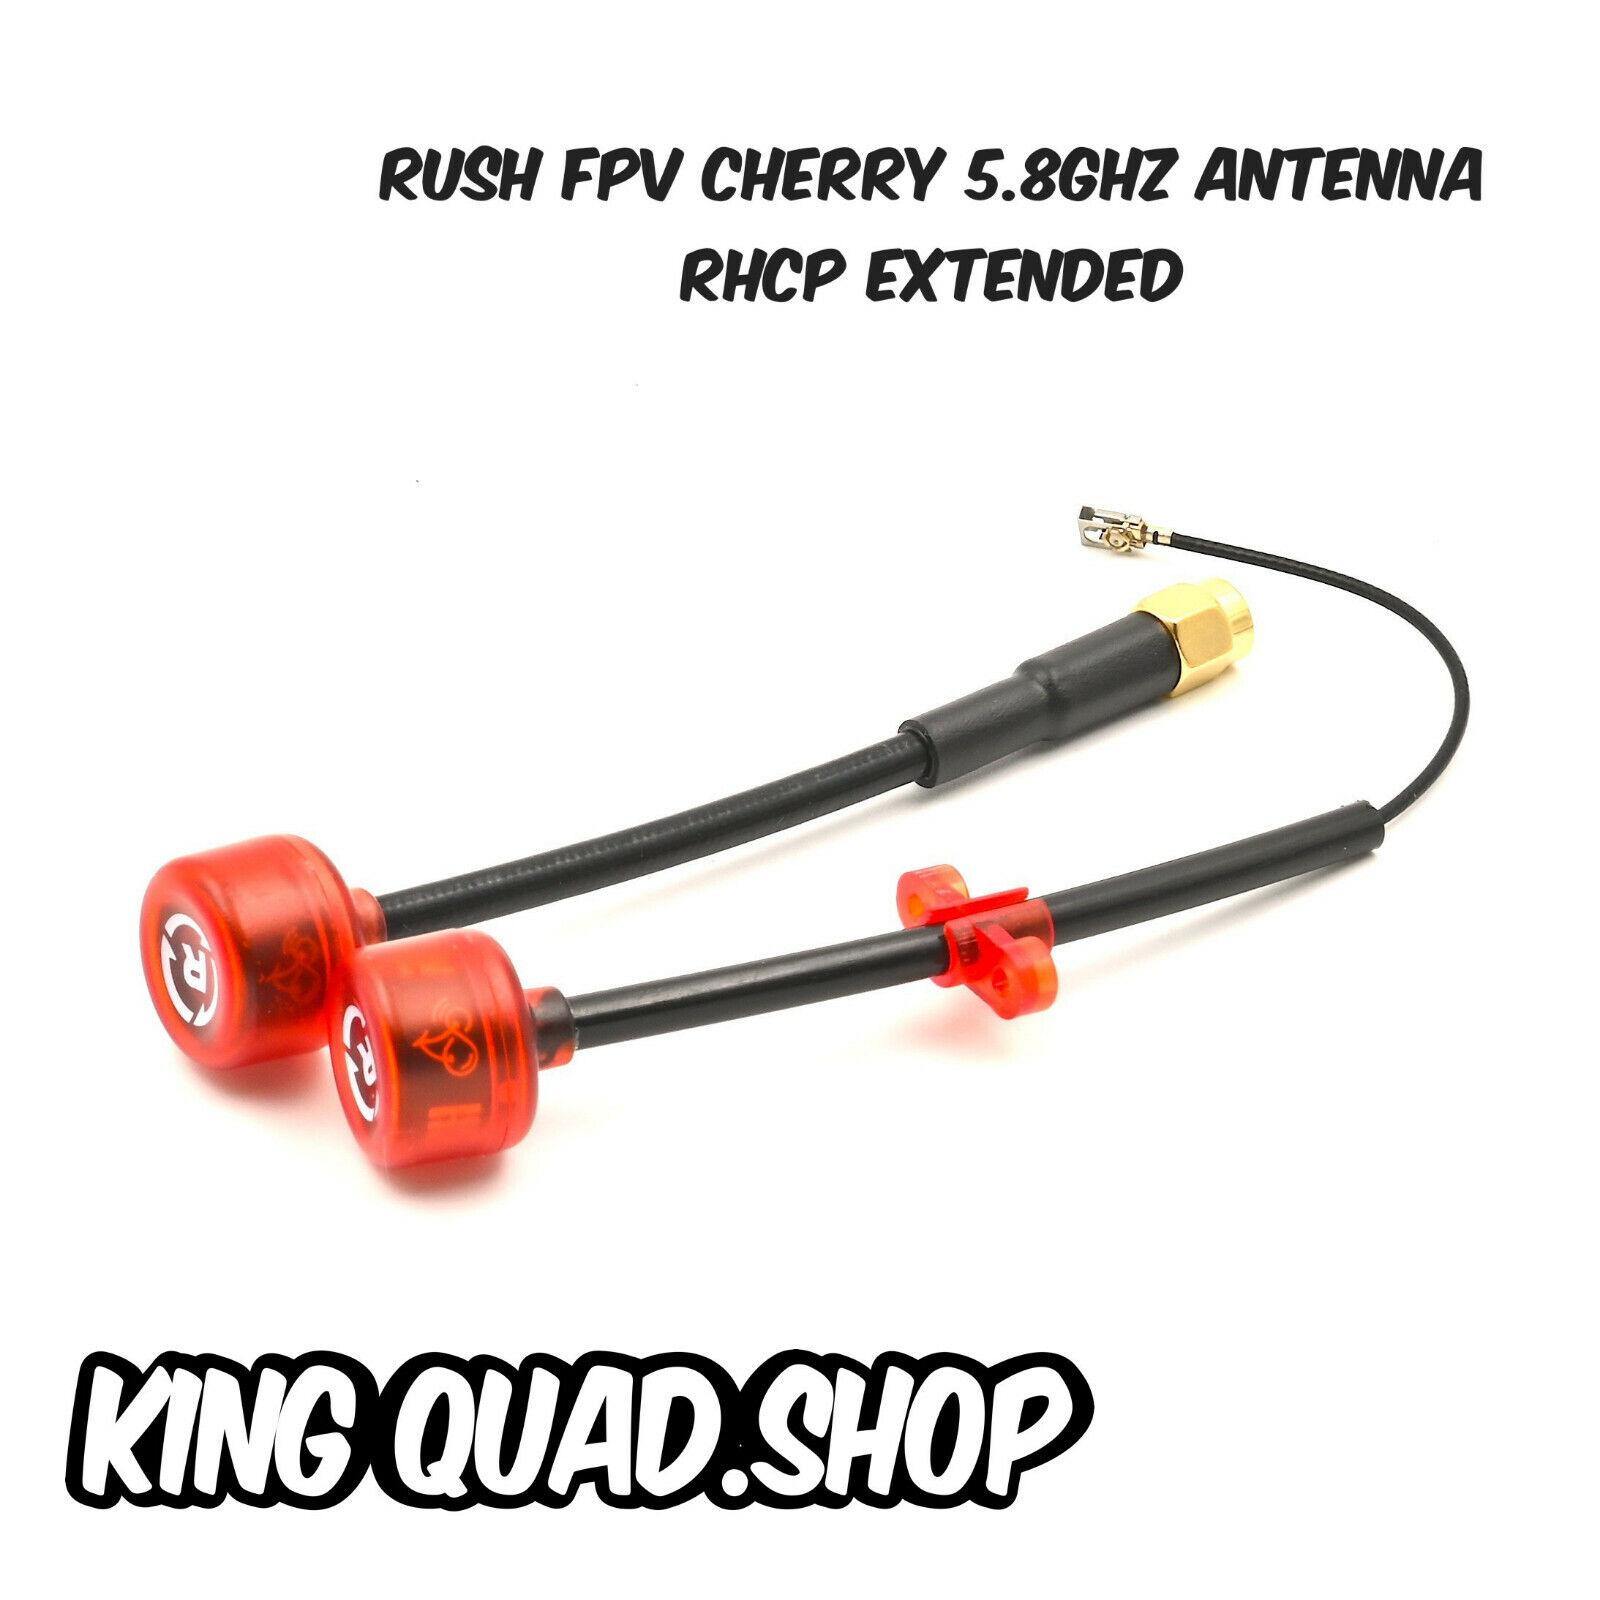 Rush FPV Cherry 5.8ghz Antenna RHCP Extended Designed By TrueRC